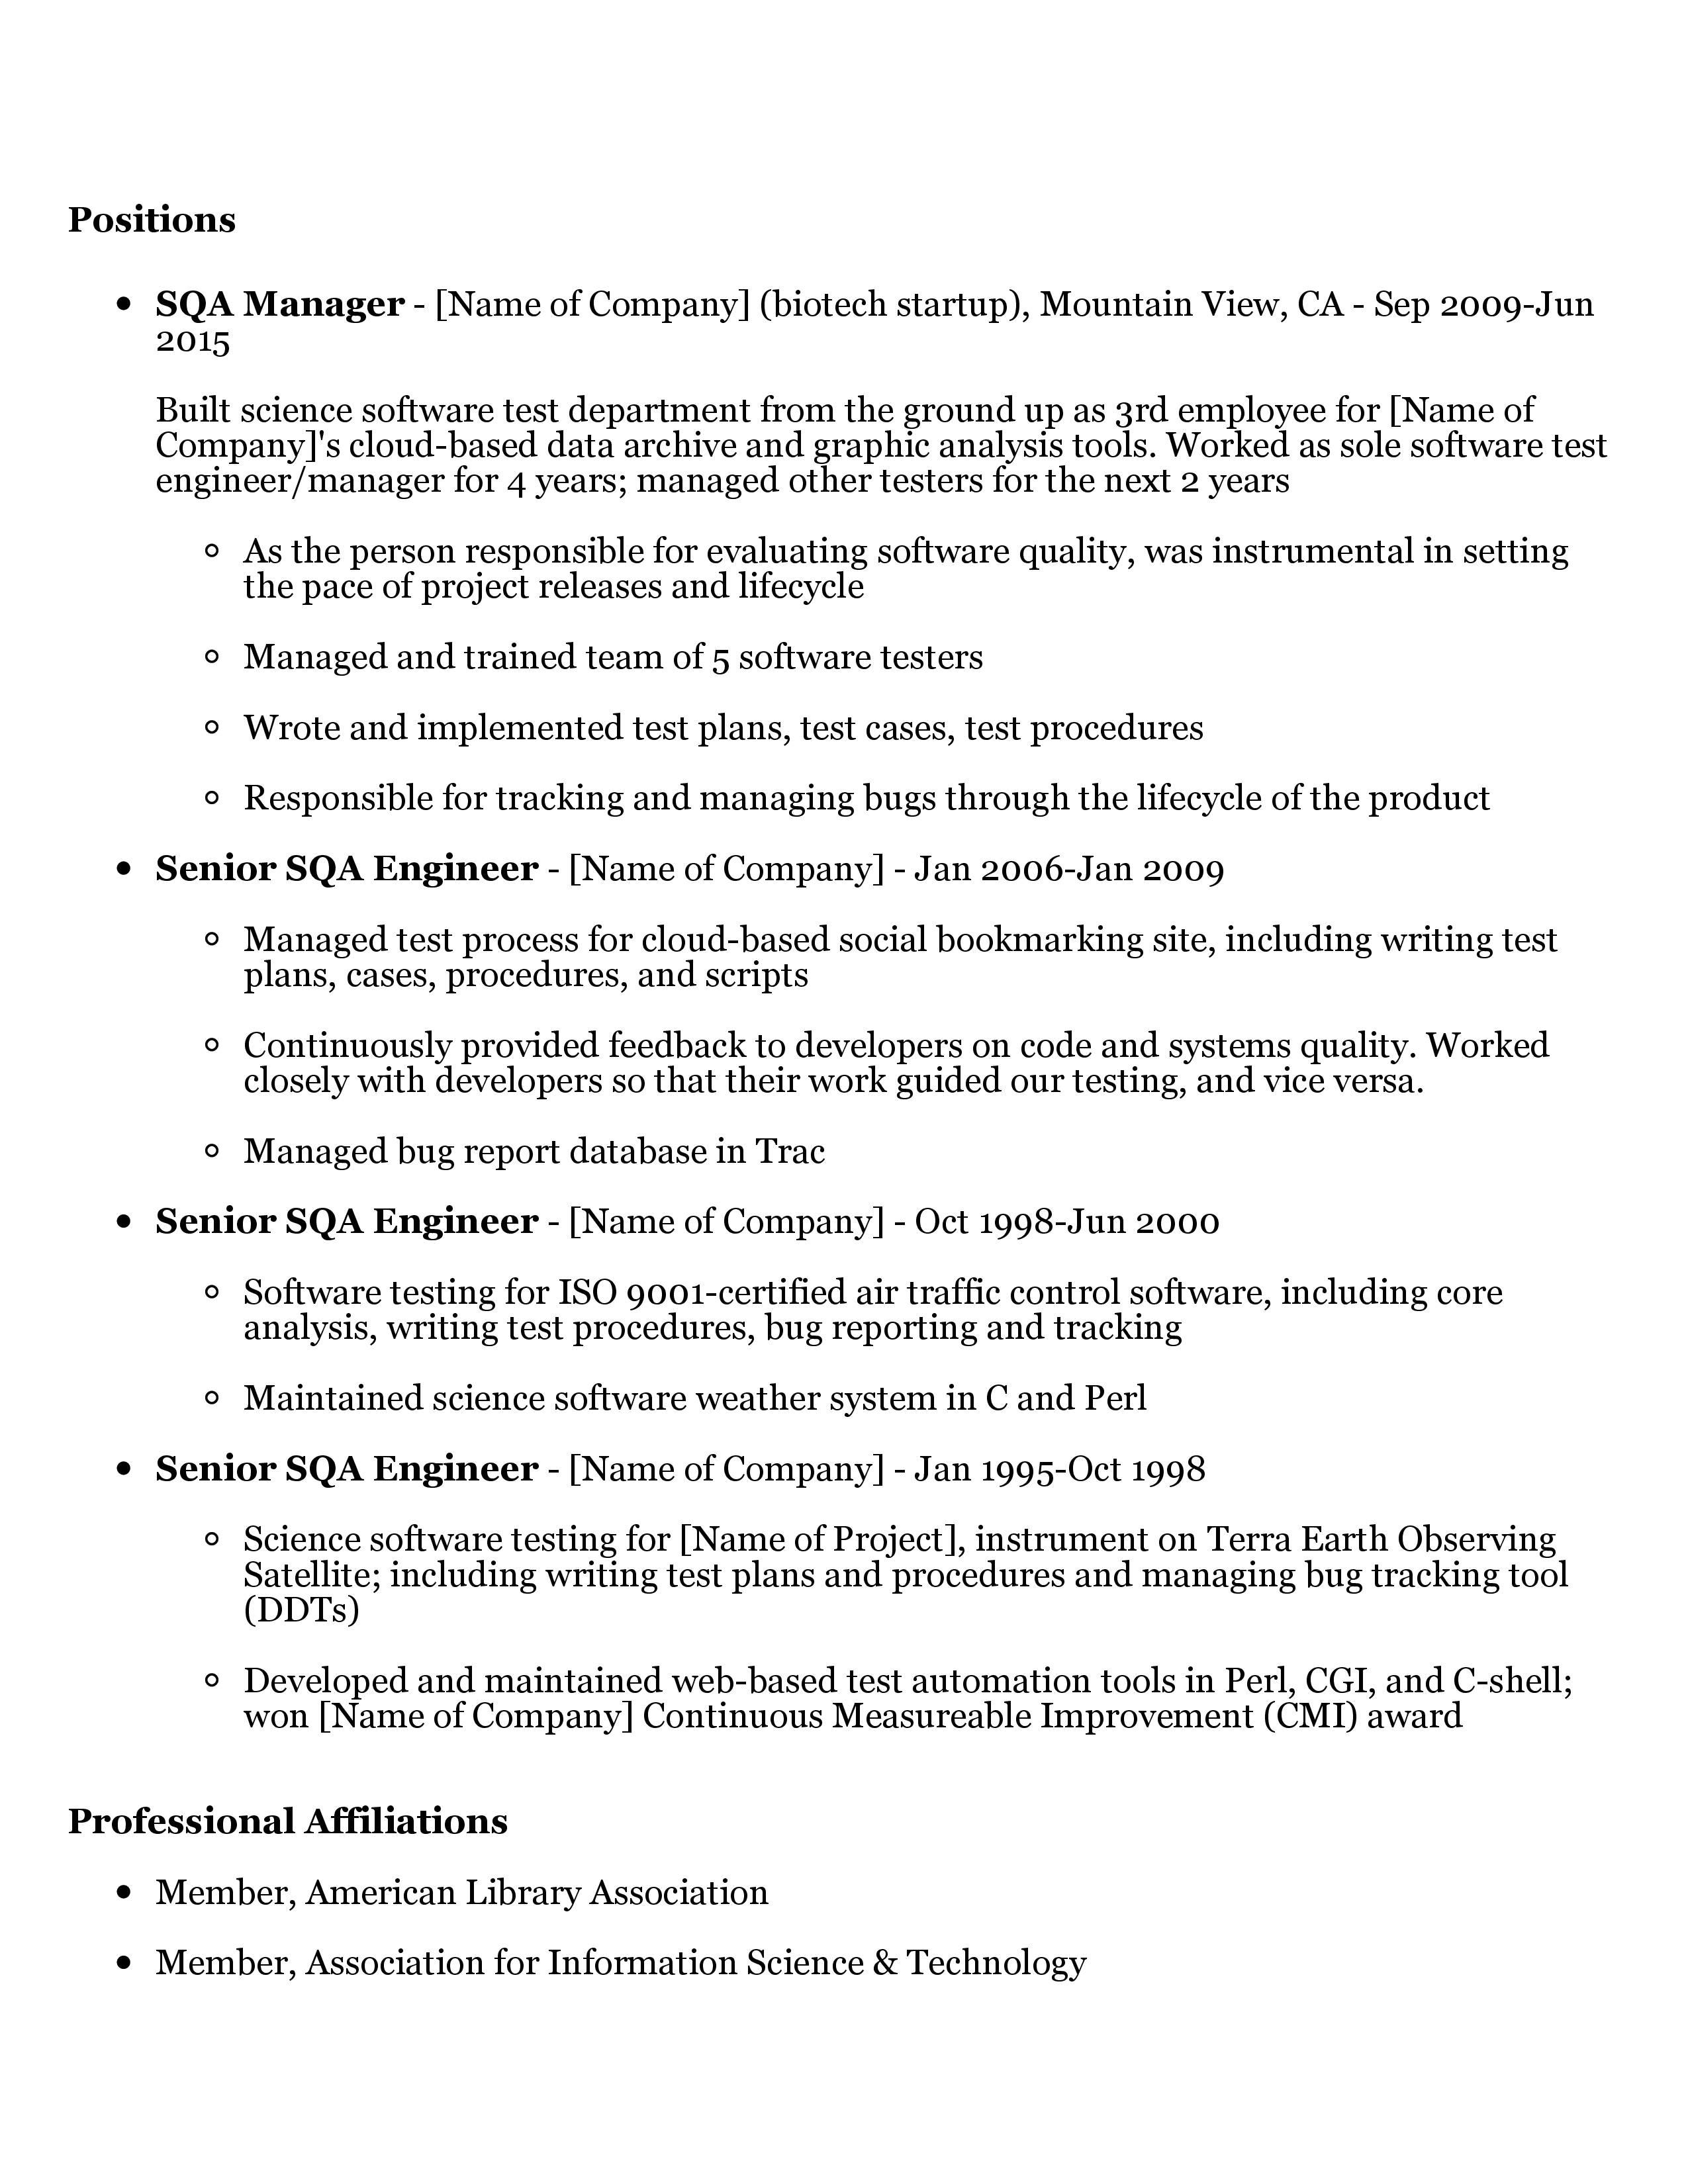 Sample Resume Utilization Review Nurse | Company Profile Template